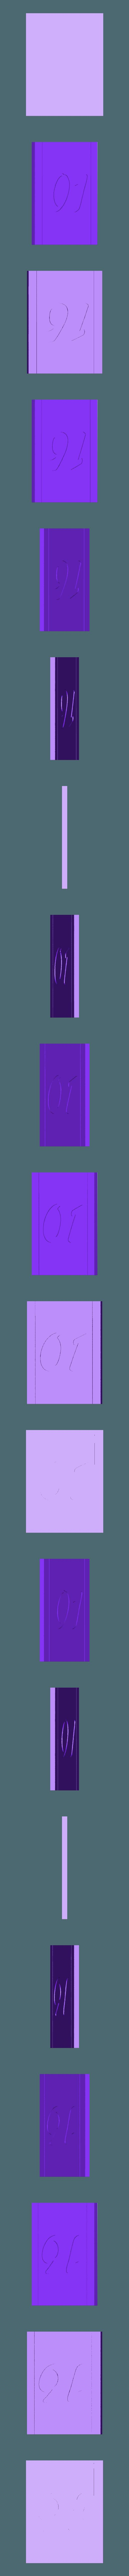 1_-_16.stl Download free SCAD file Perpetual Flip Calendar (W/ Customizable Font) • 3D printable model, Dsk